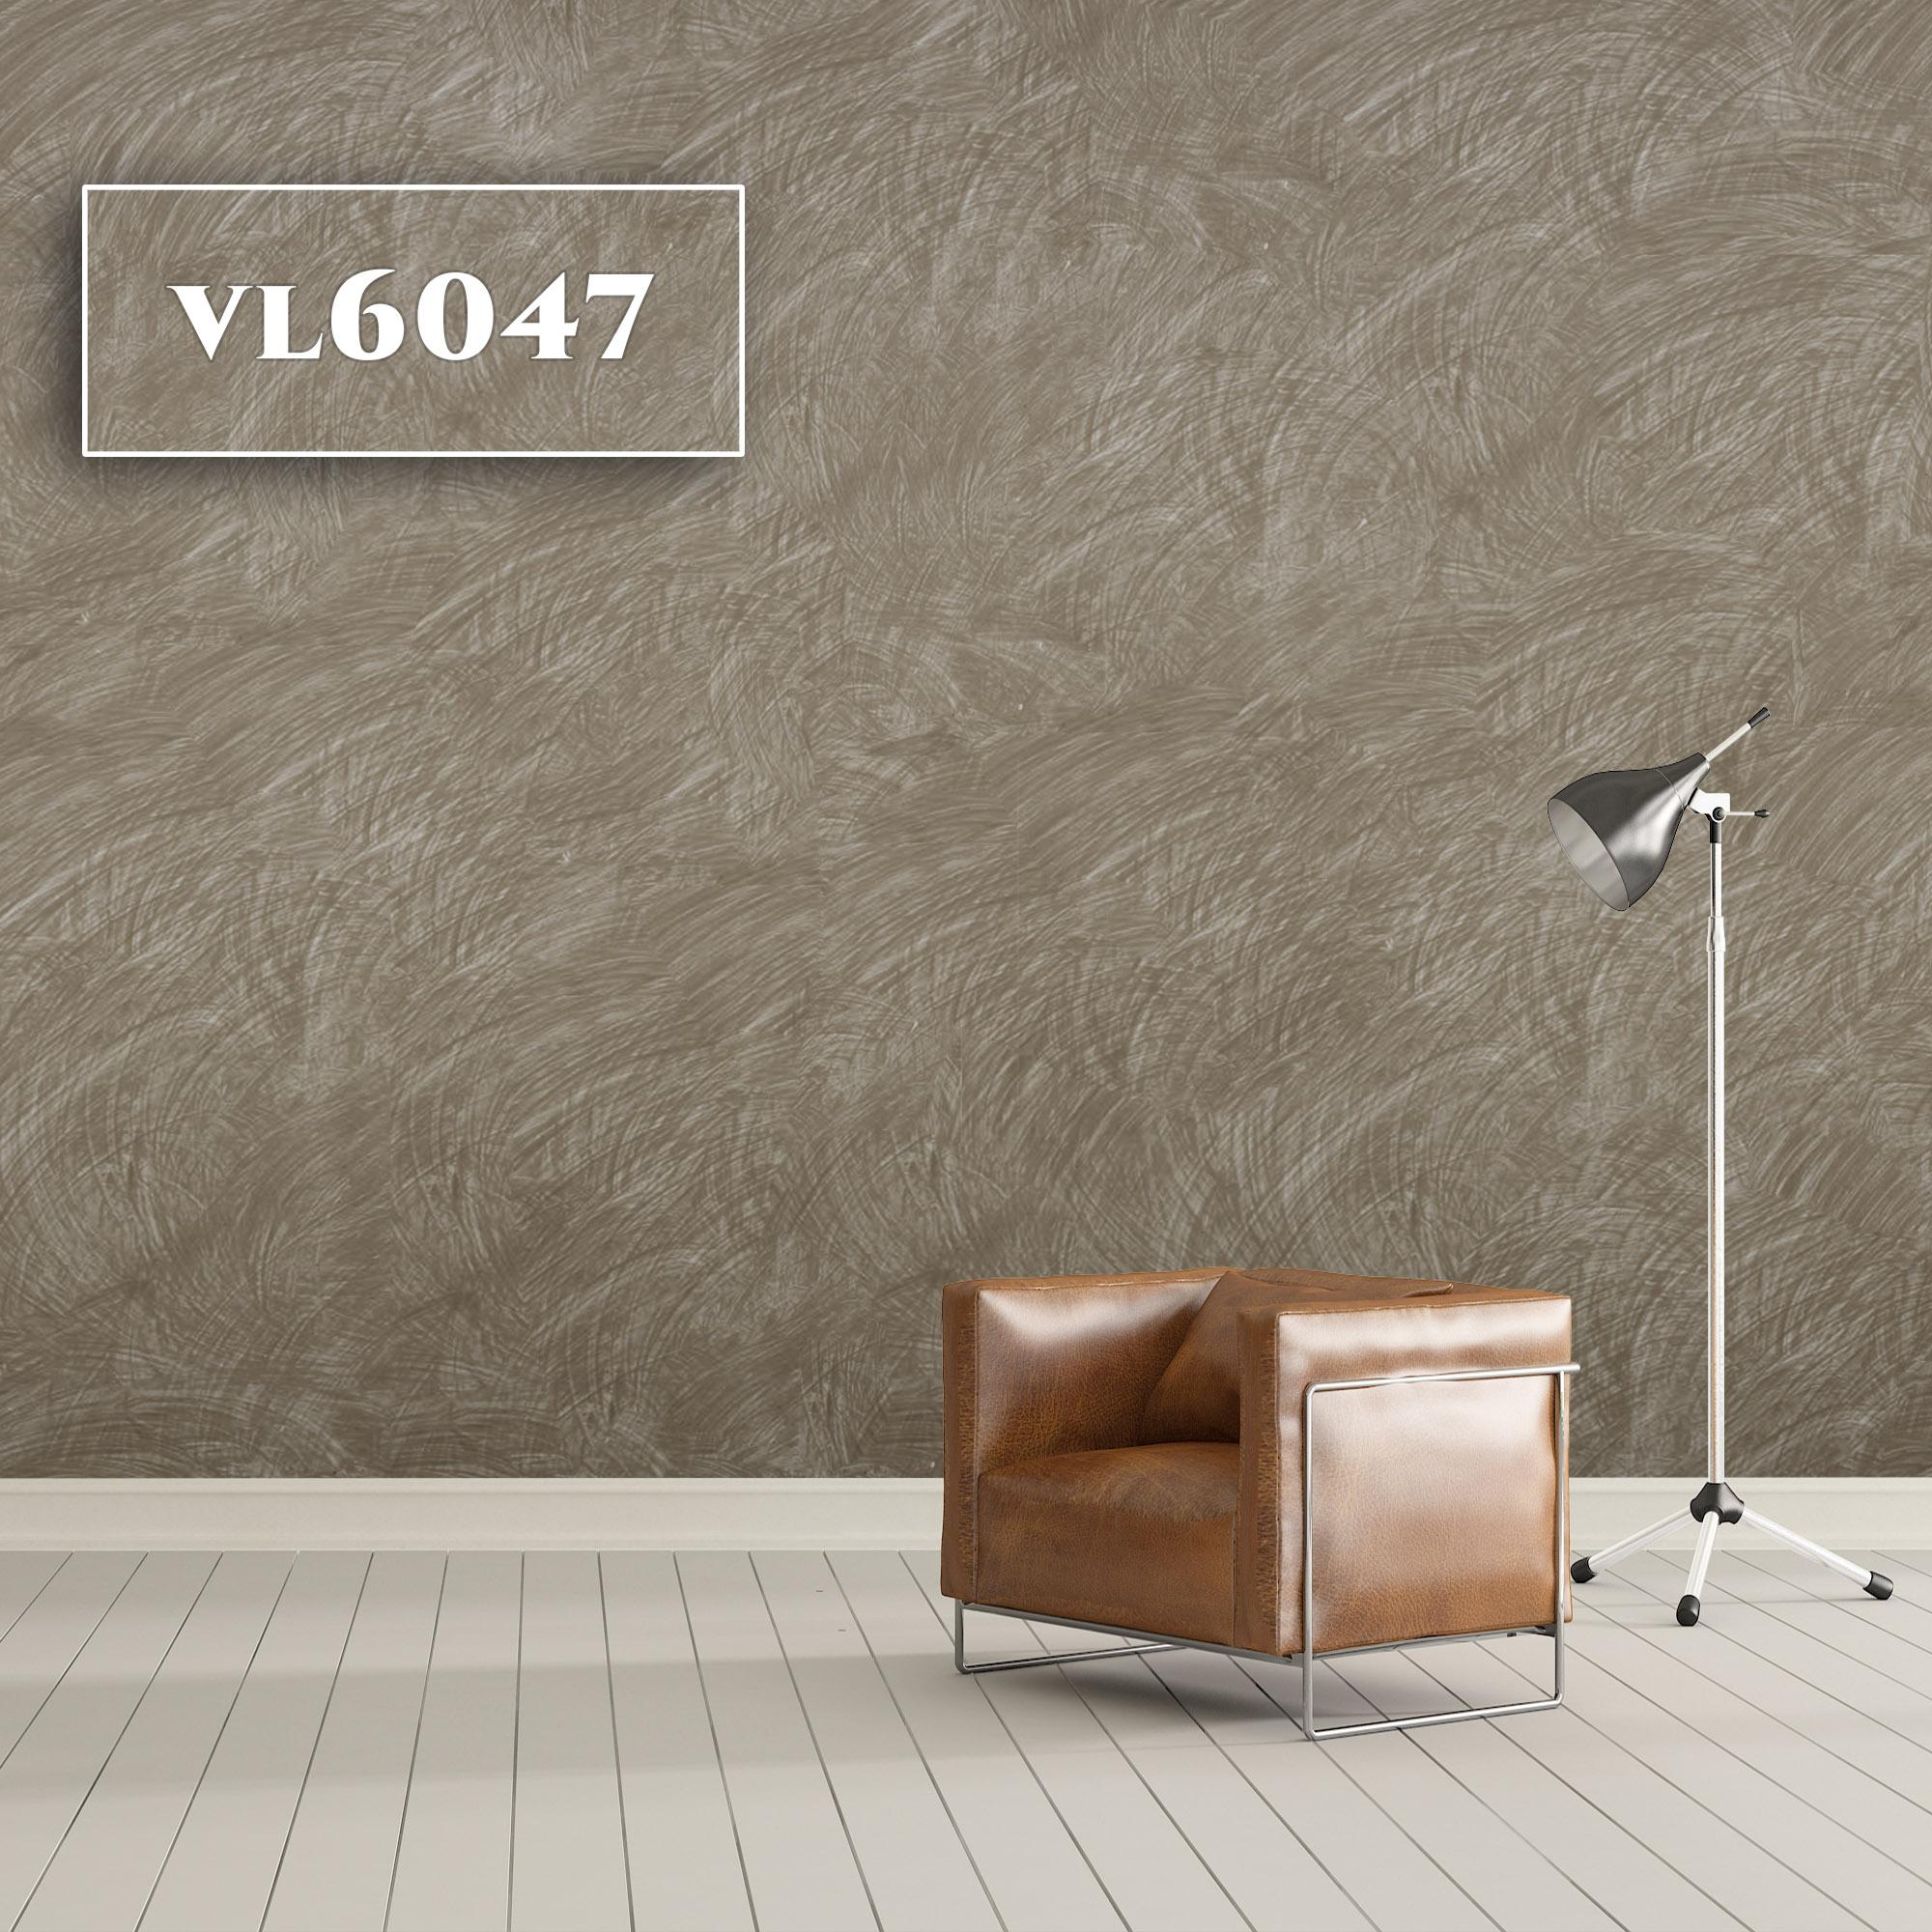 VL6047